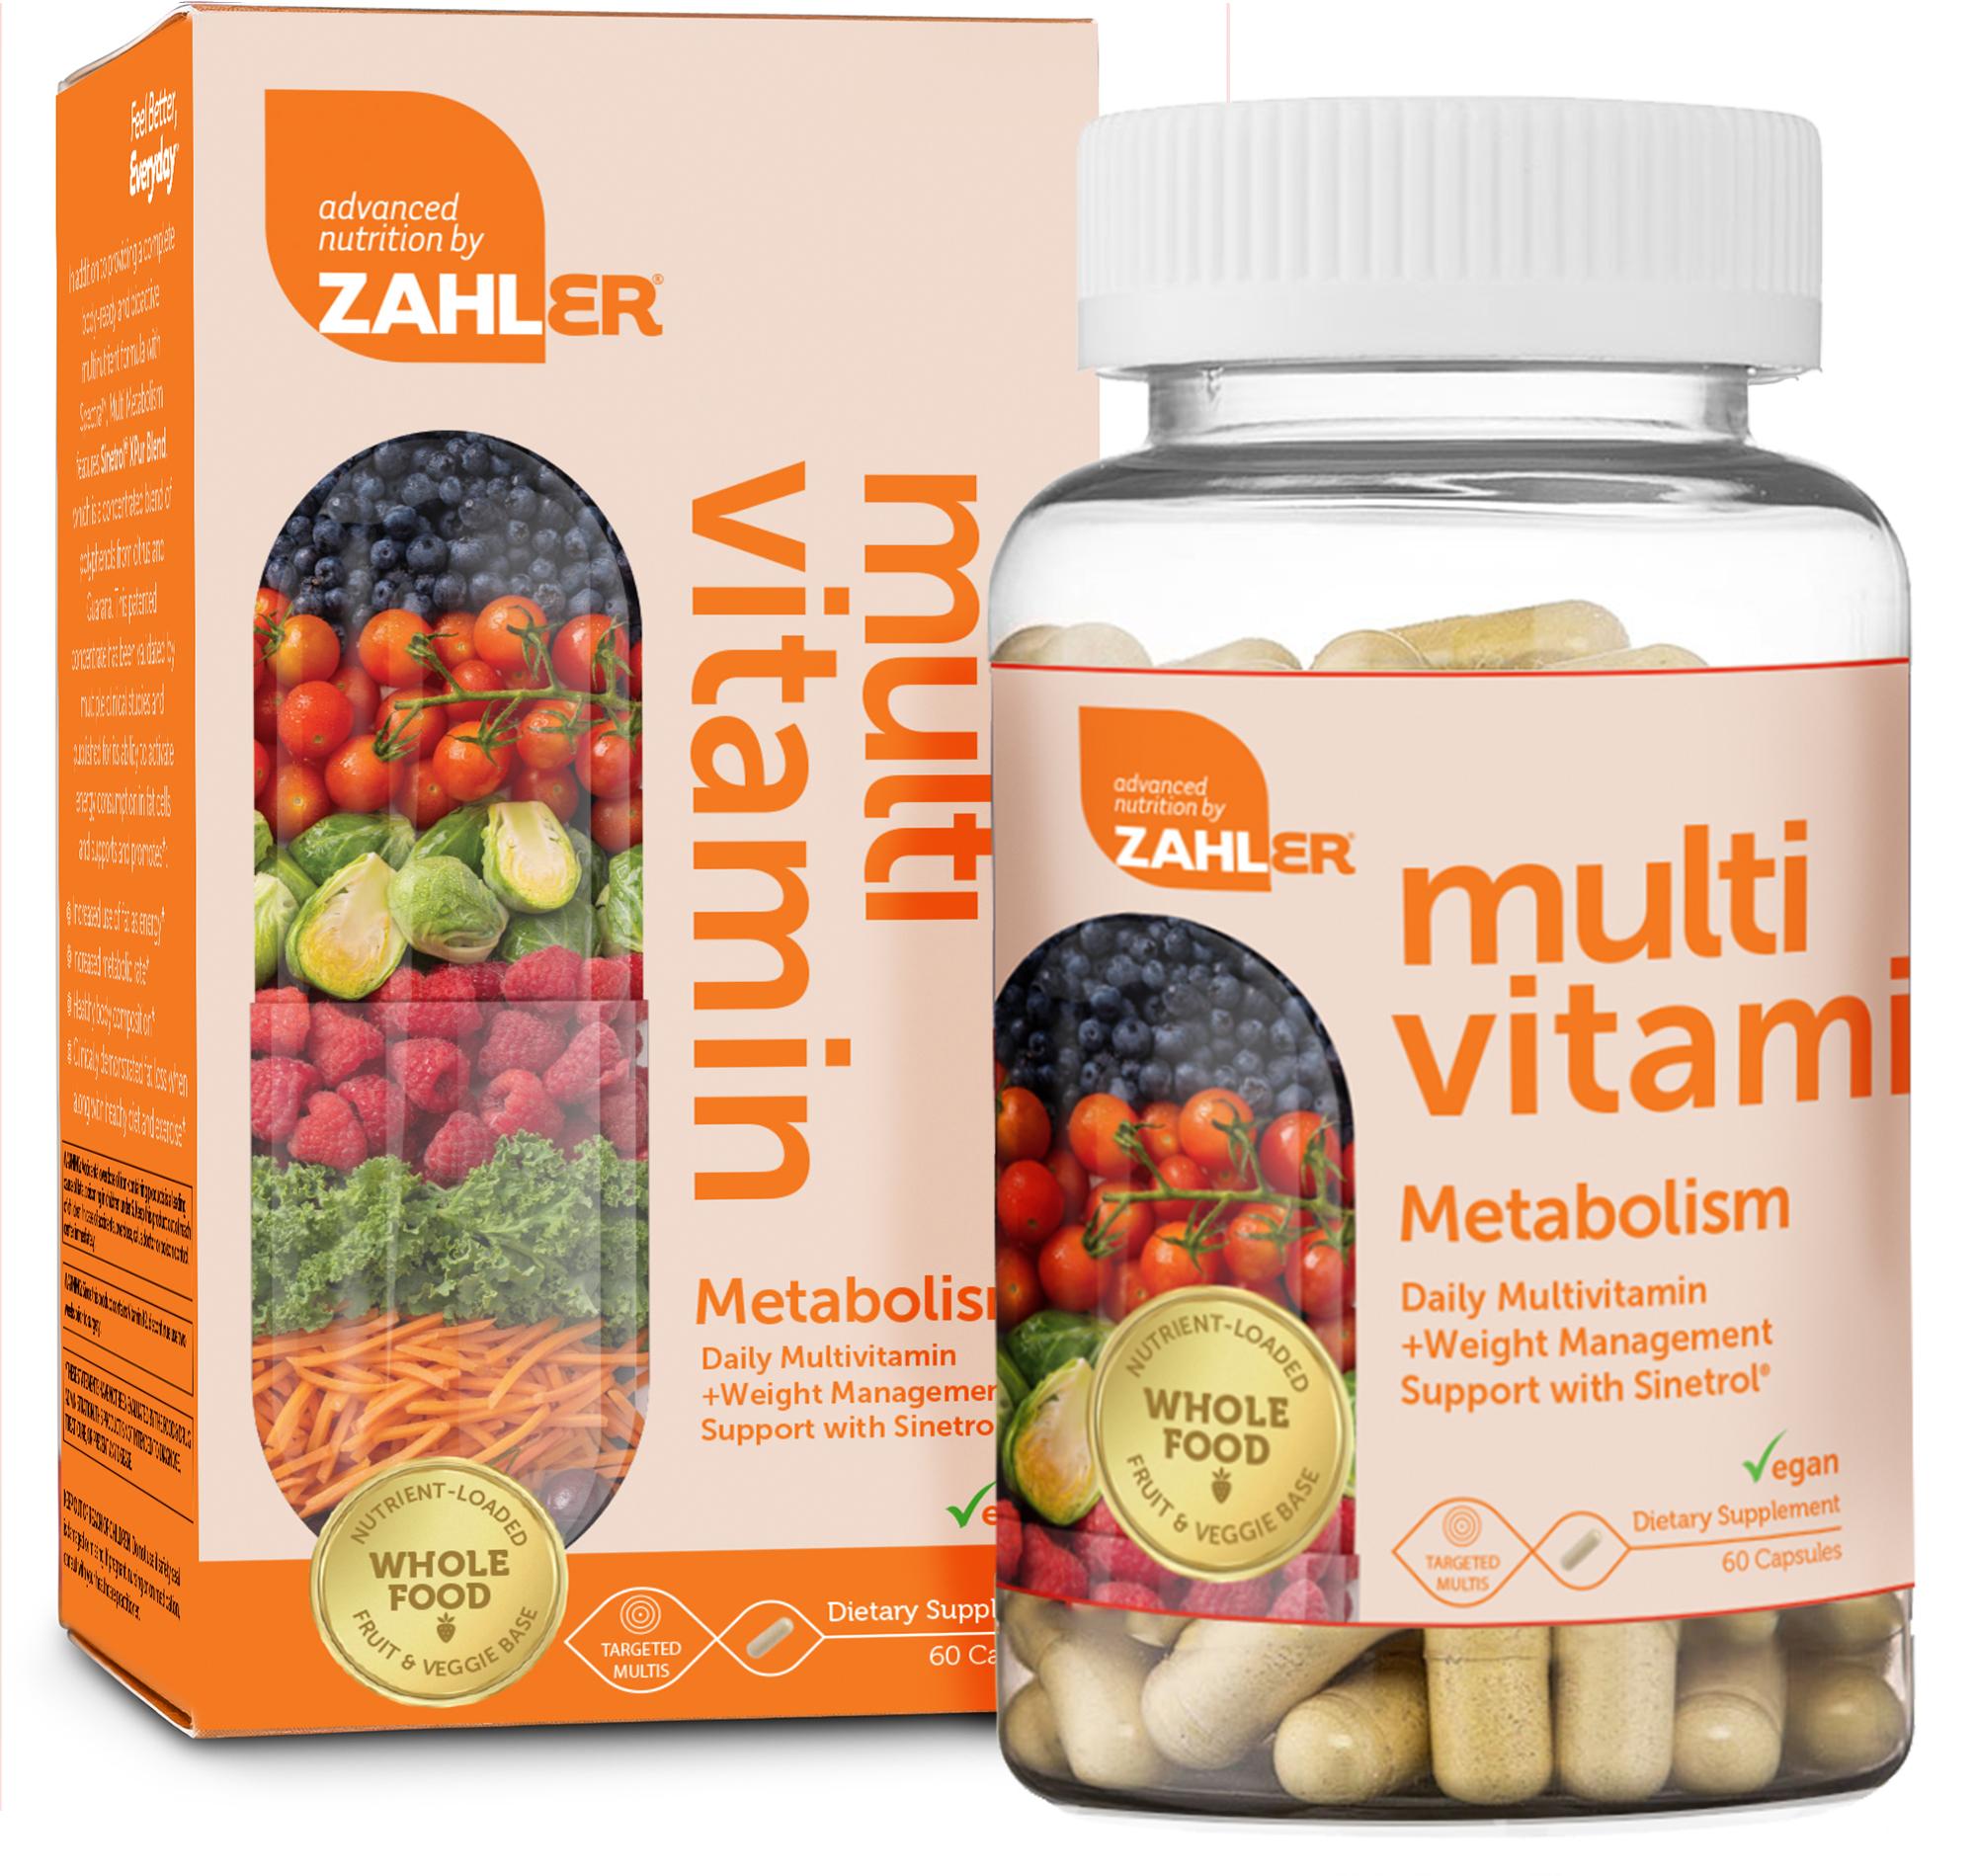 Multivitamin Metabolism